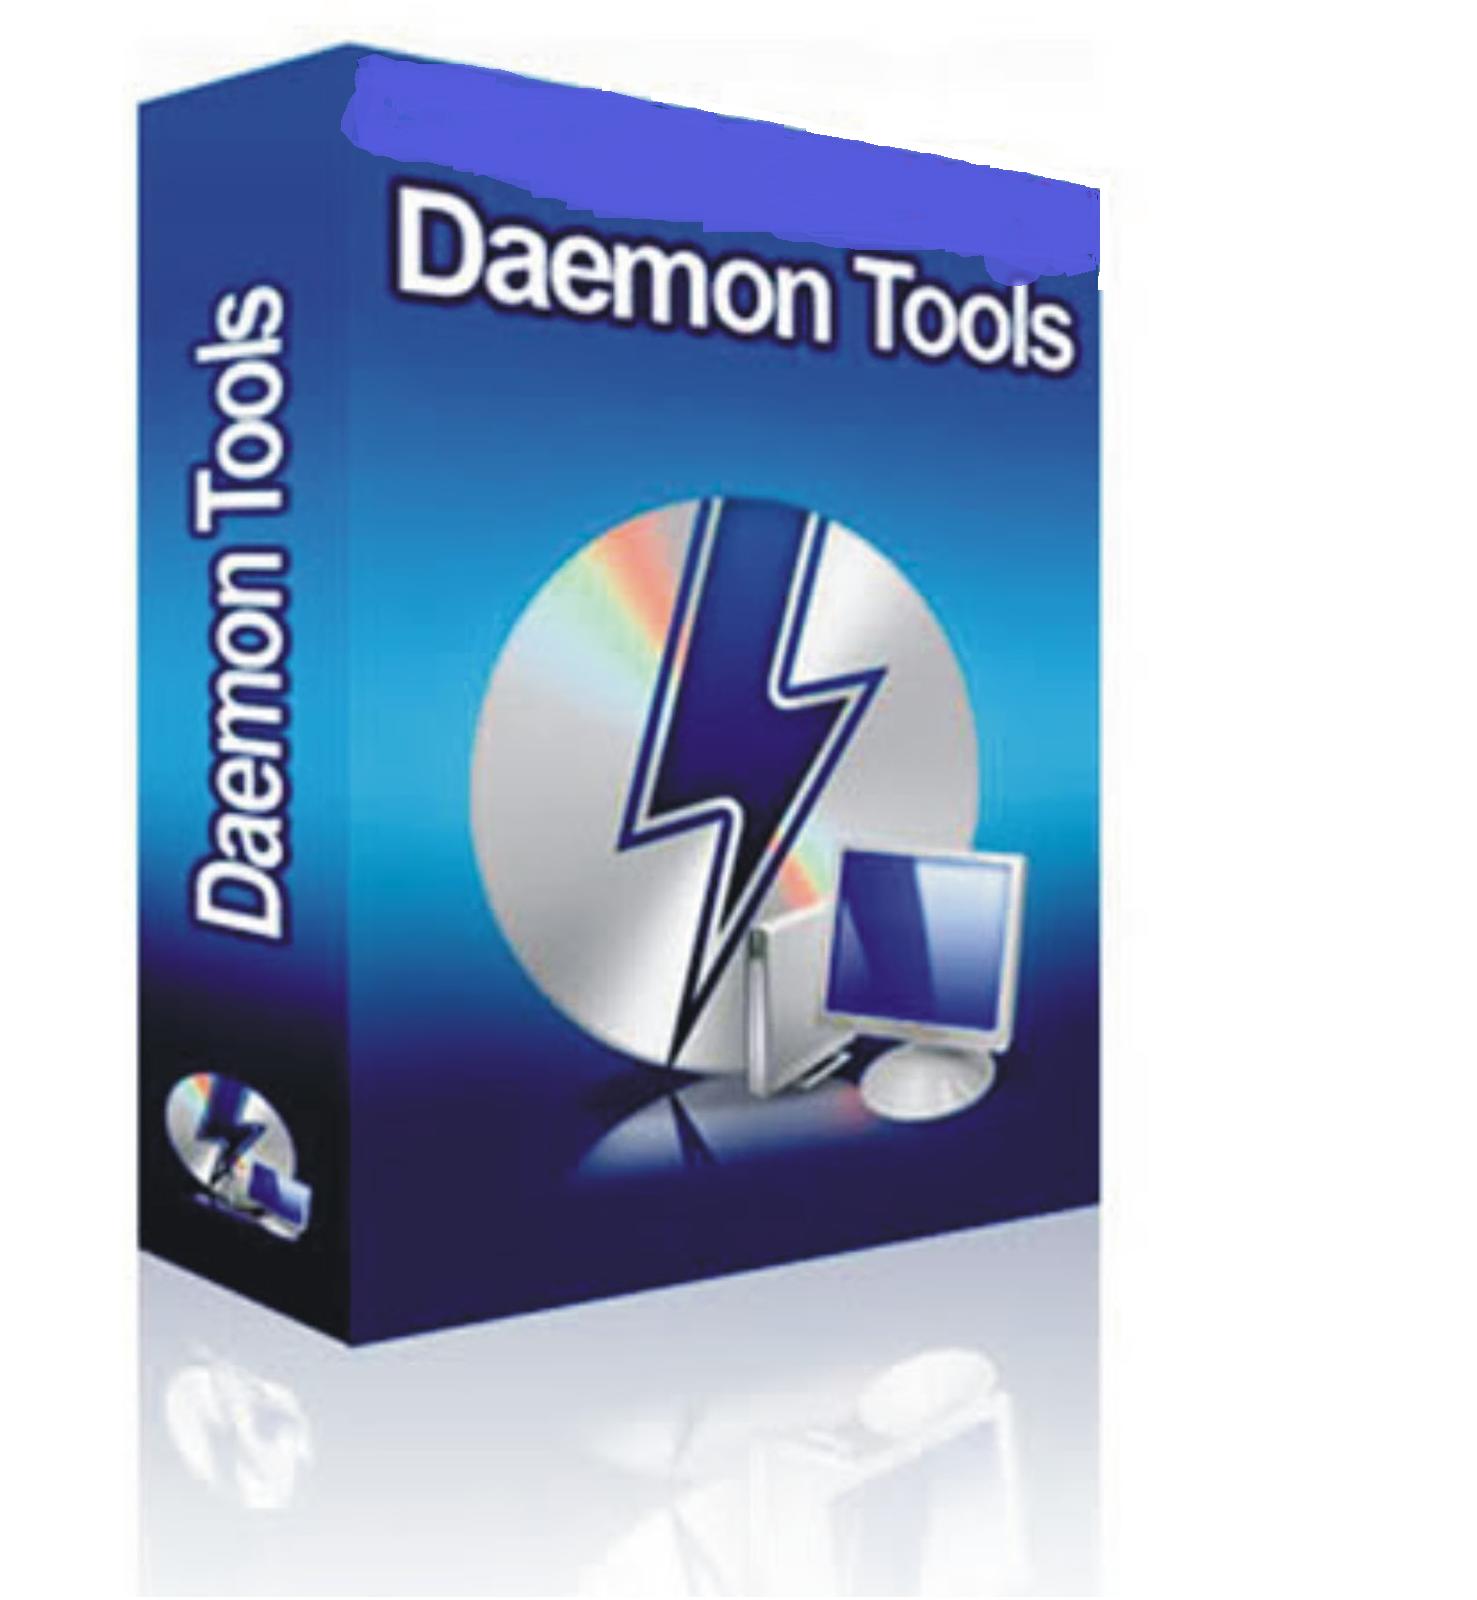 Daemon tools ultra 2 rapidshare for Daemon tools